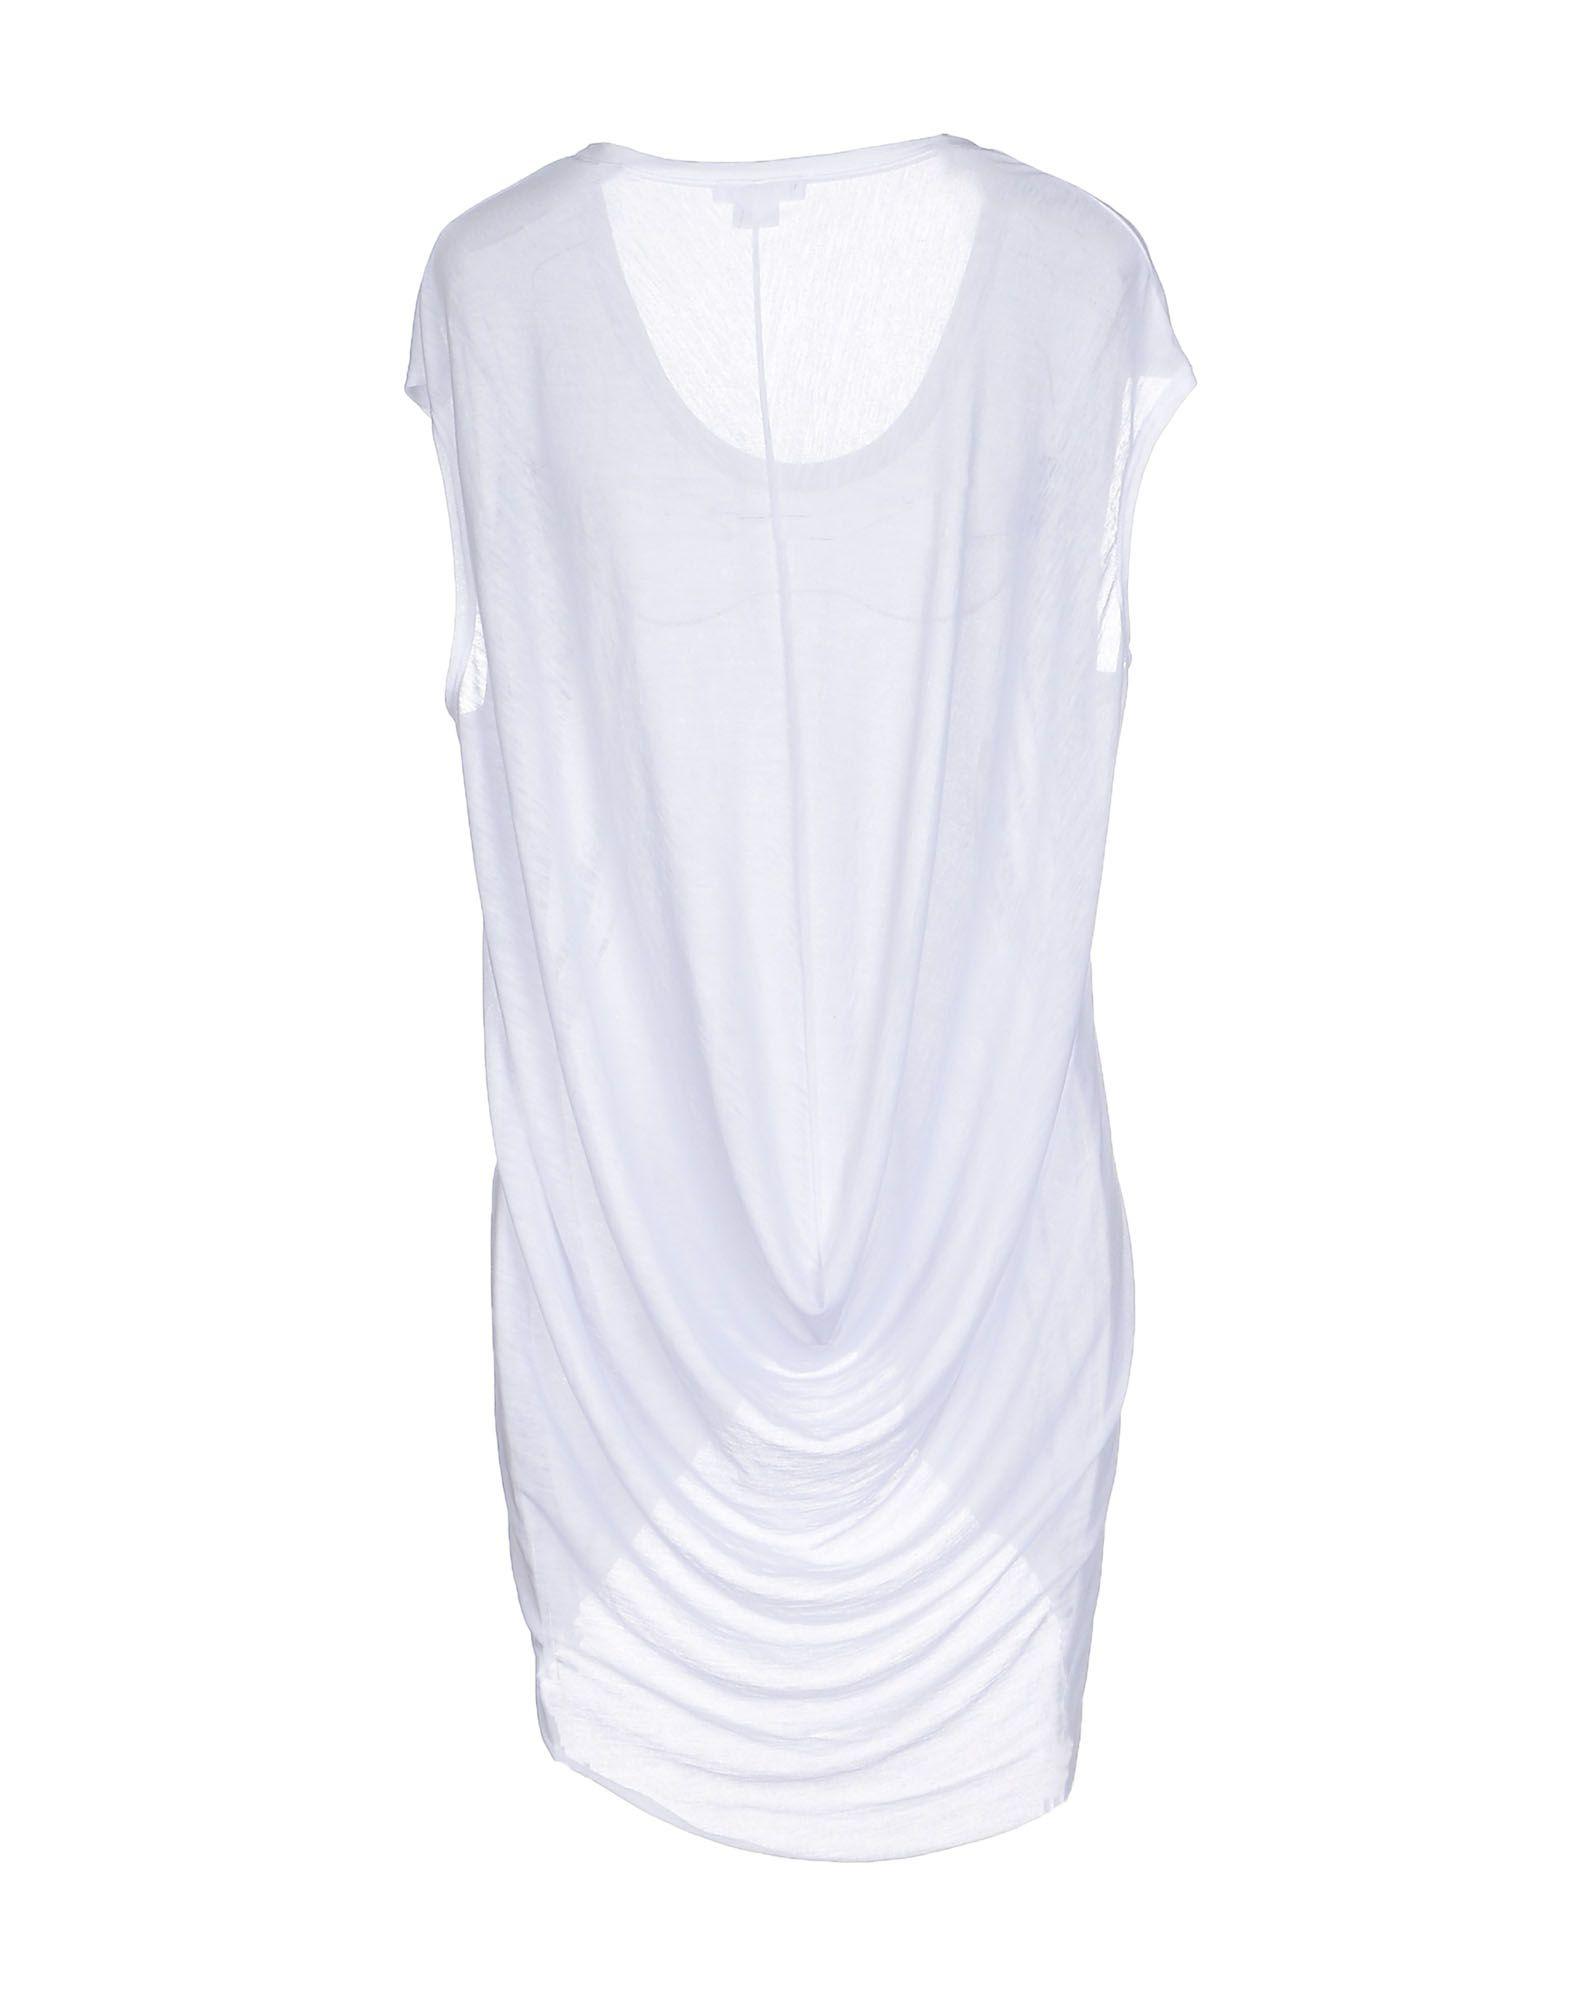 Lyst helmut lang t shirt in white for Helmut lang t shirt